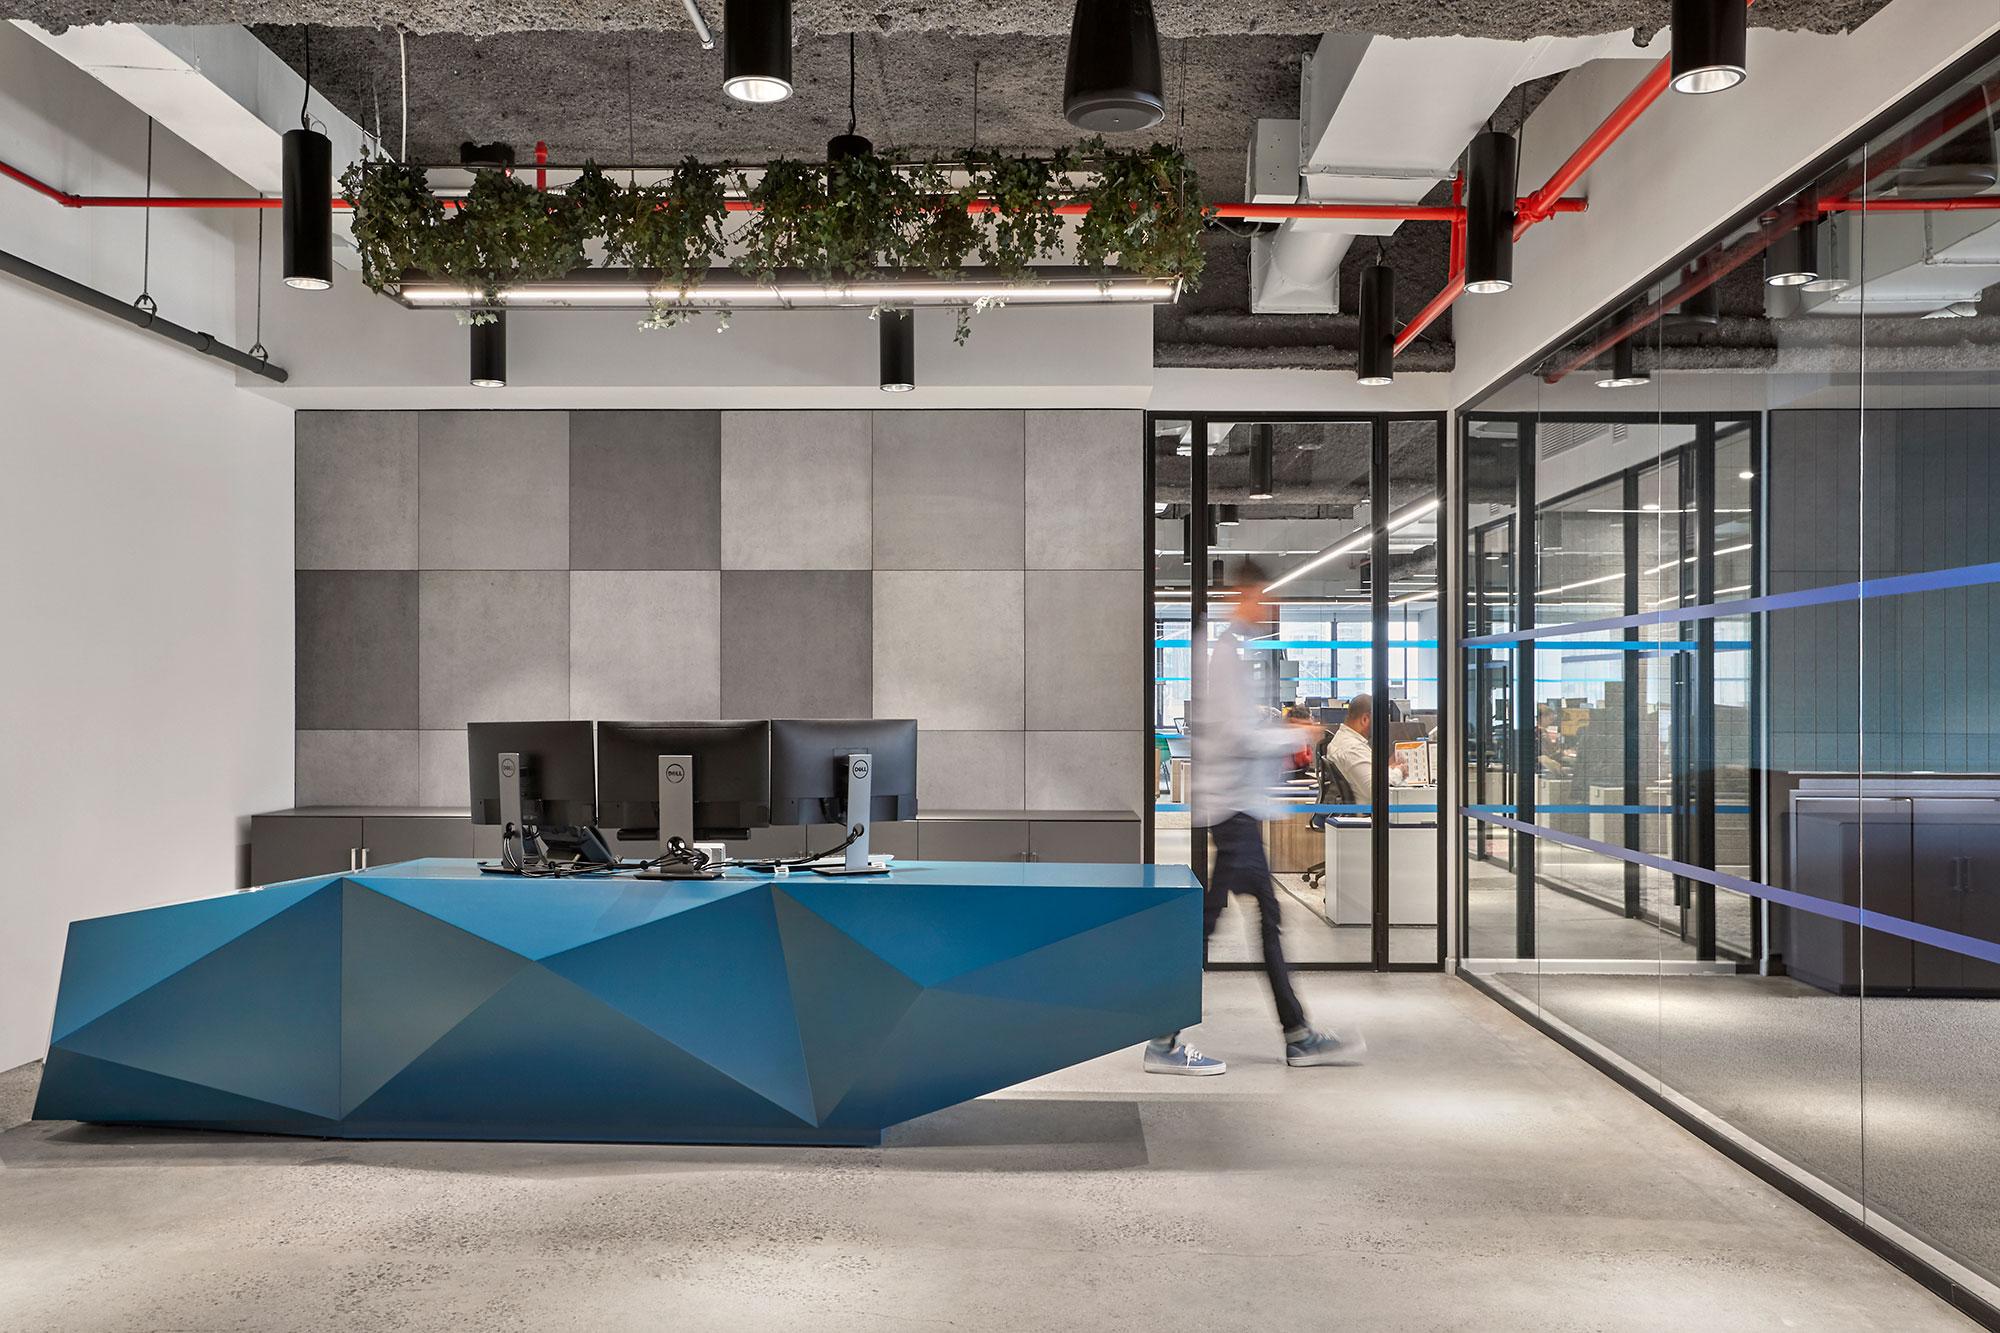 Kirigami blue angled reception unit